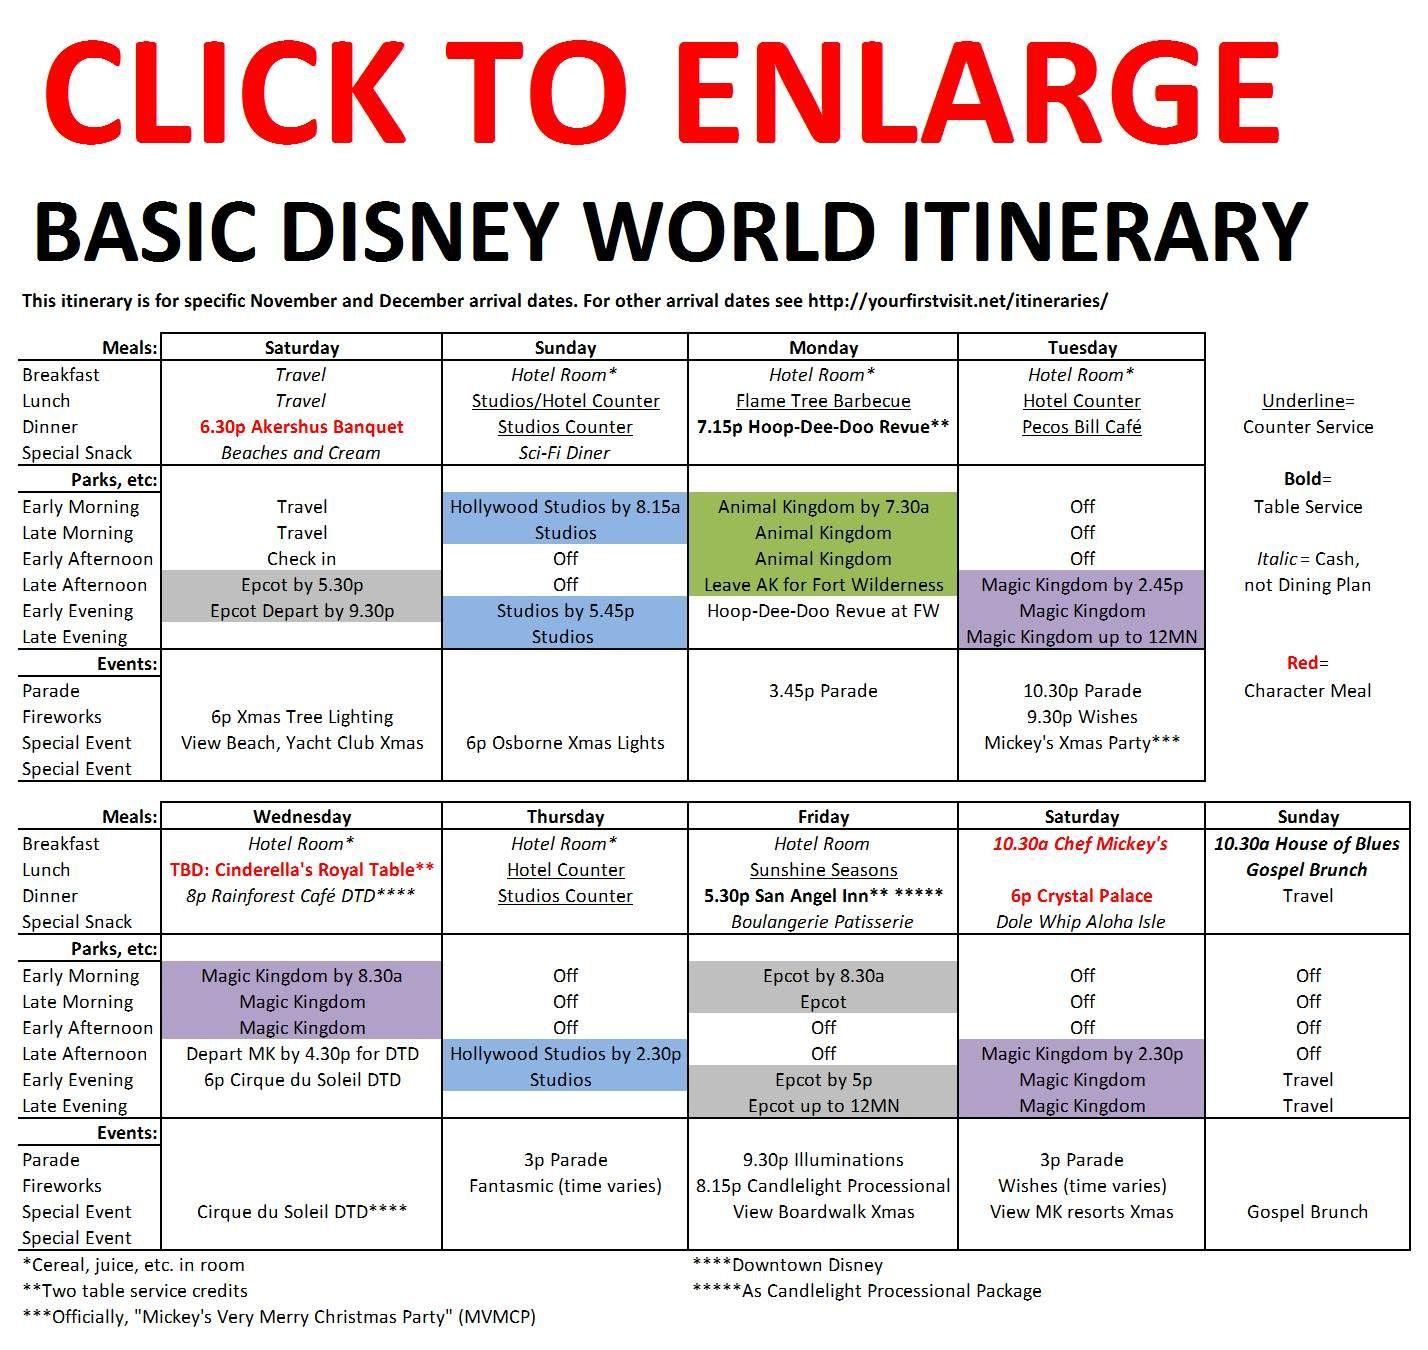 Basic 2019 December Disney World Itinerary | All Things